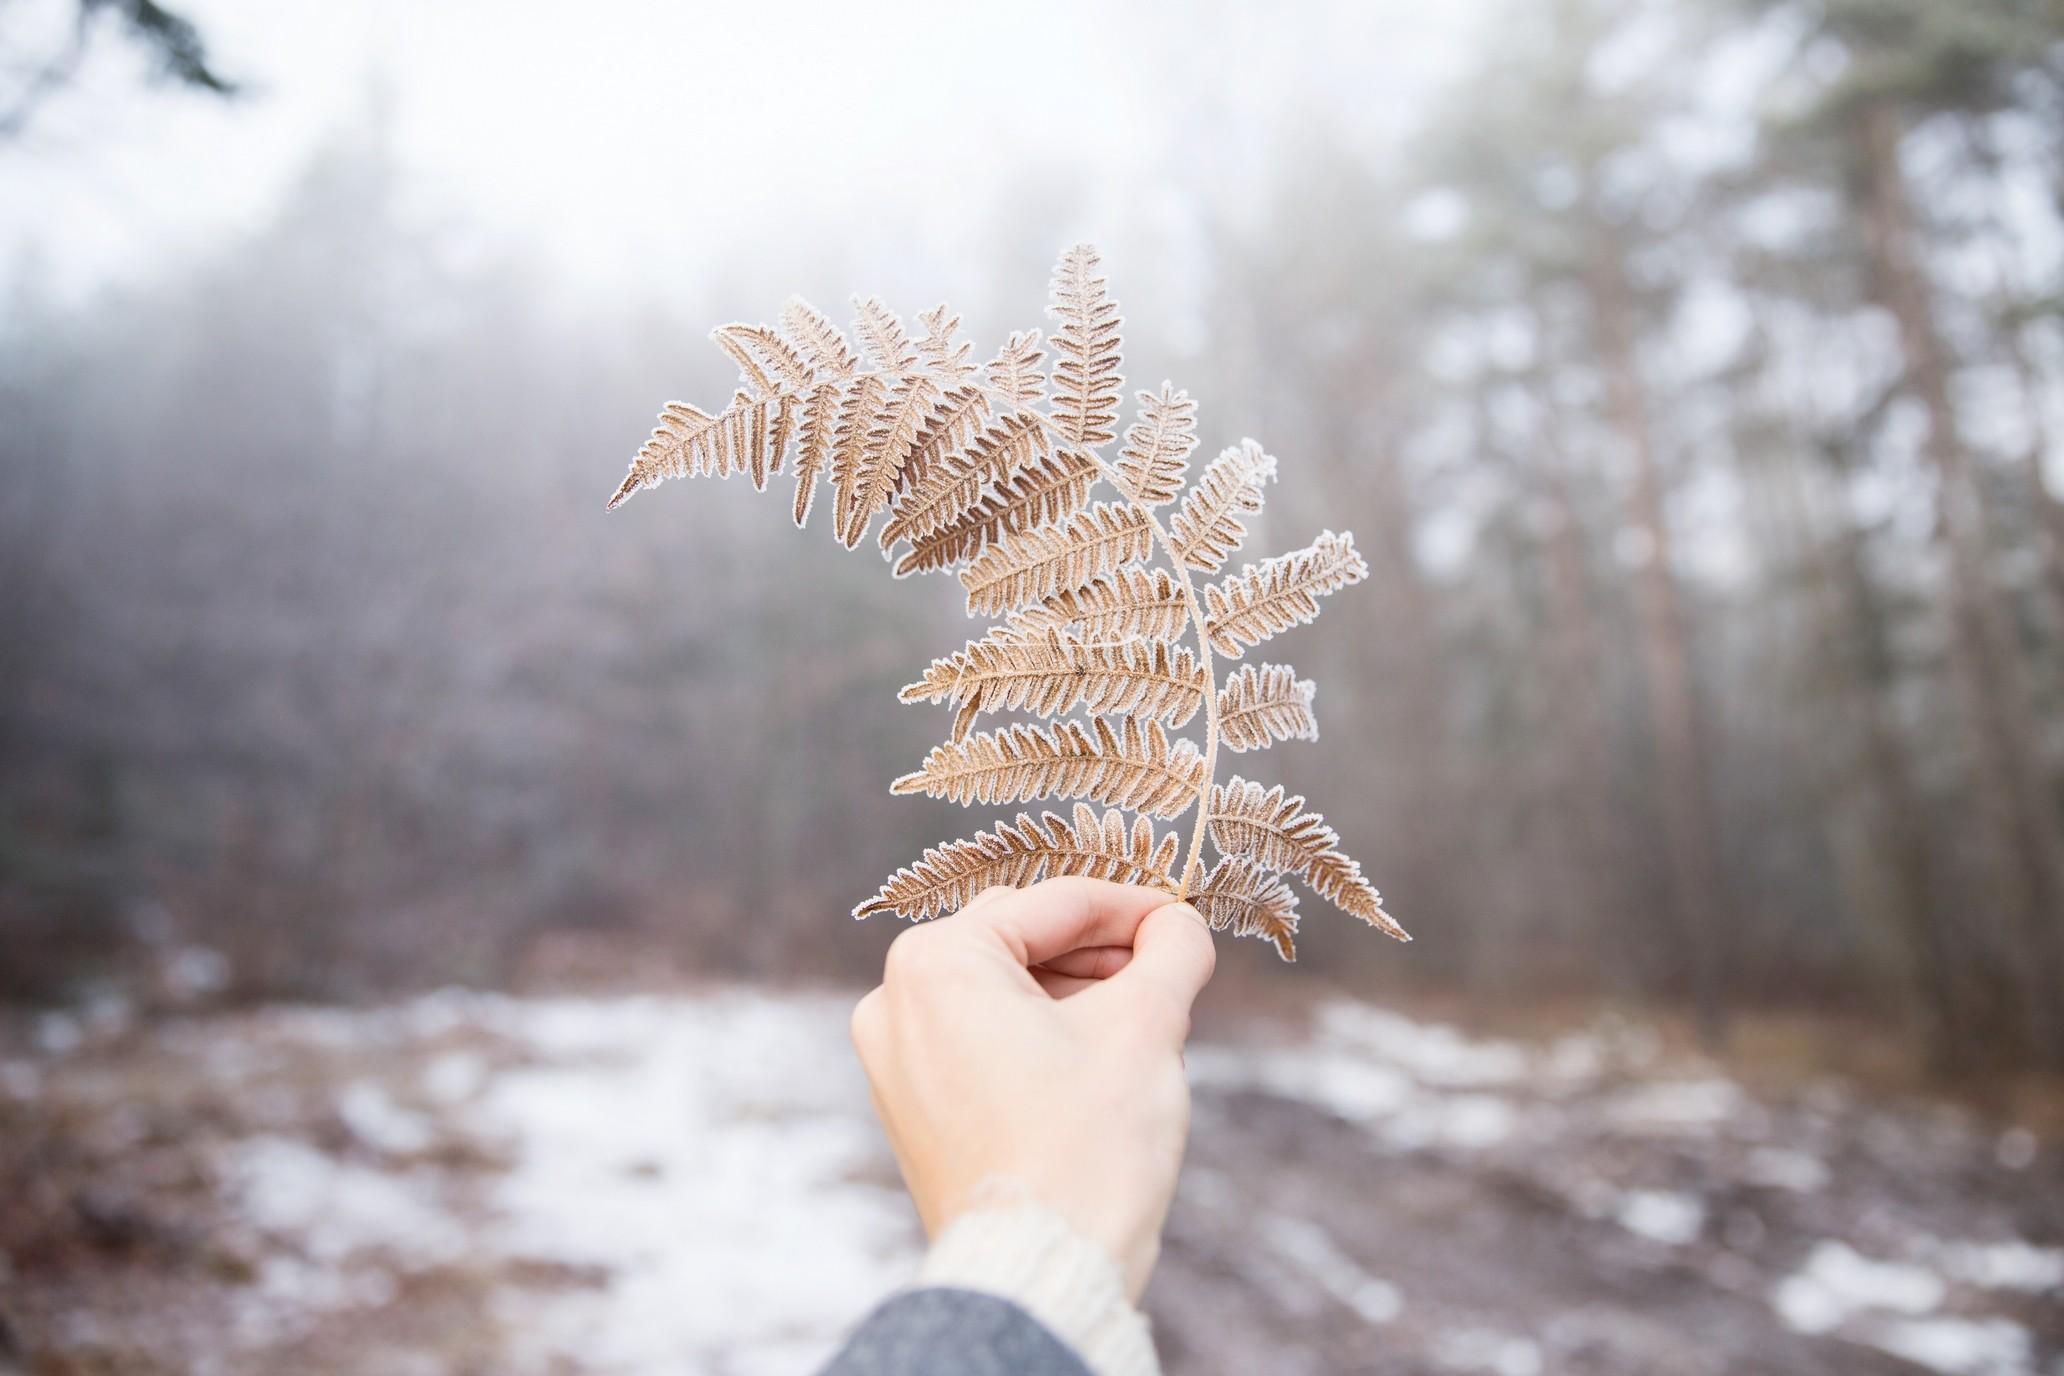 Blue Spruce Winter Snow Desktop Wallpaper. 1740 193. 1146 110 1  pixels. Download